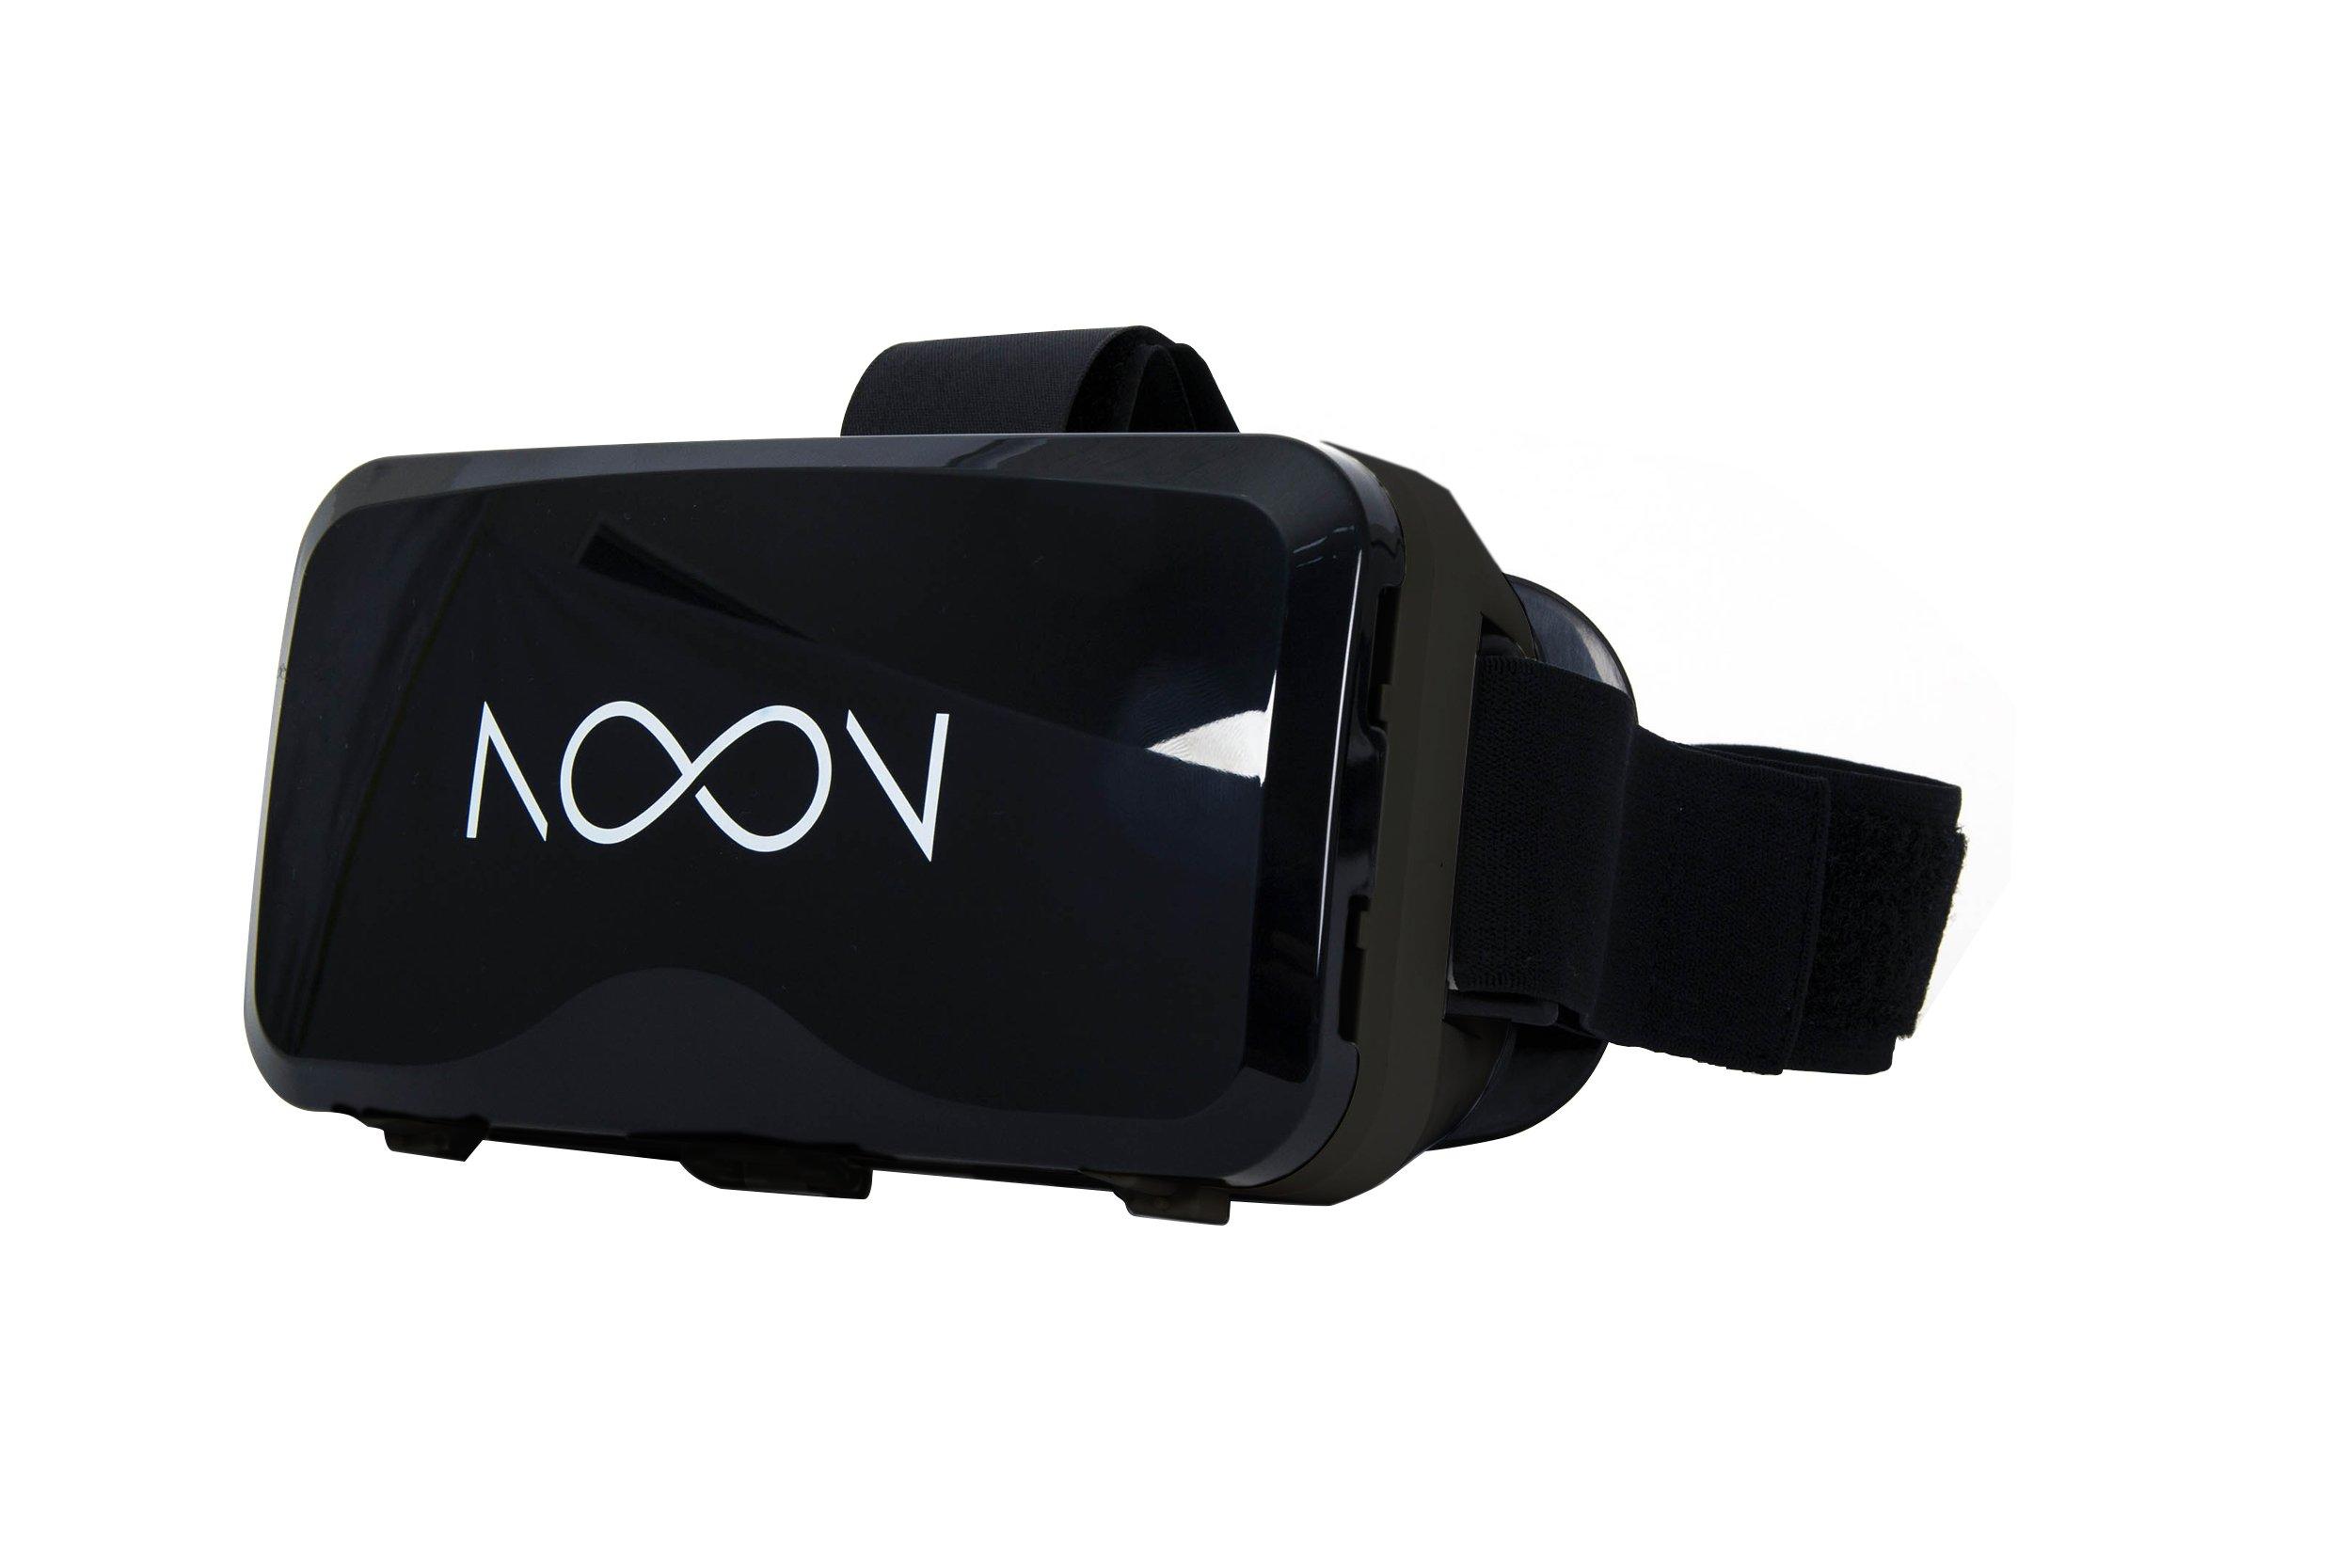 NOON VR - Virtual Reality Headset (NVRG-01)